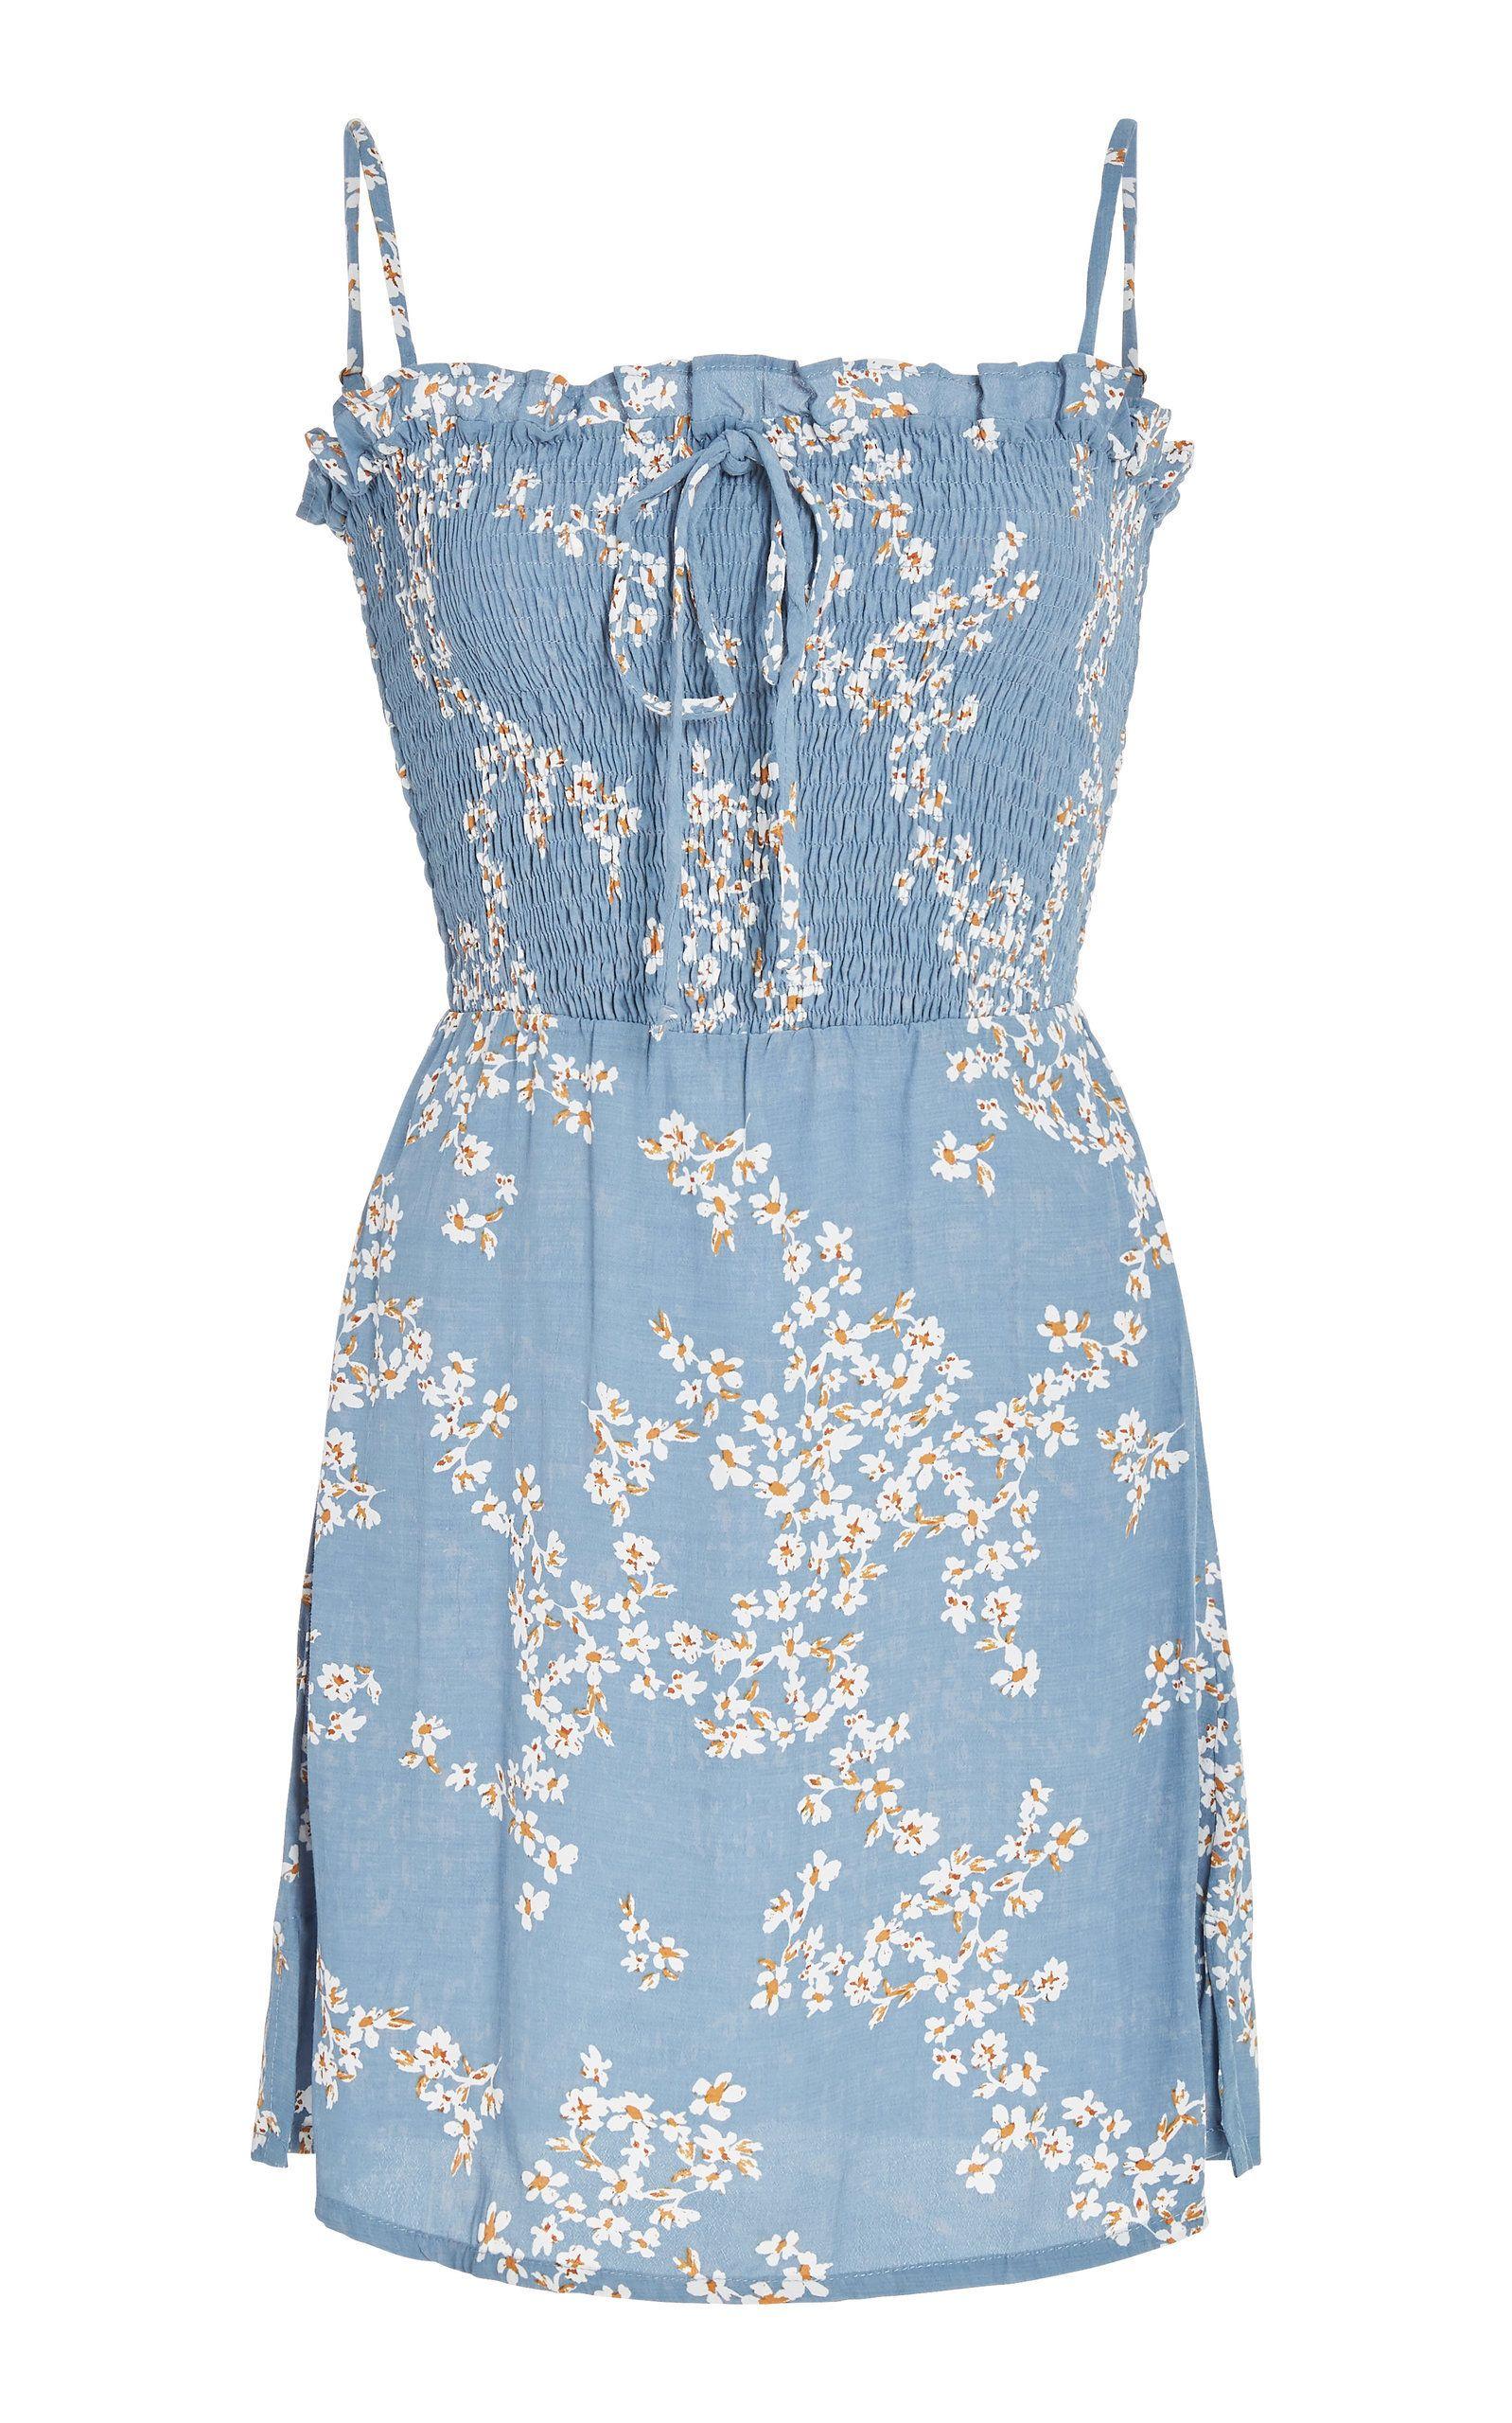 b3056e09e063 Marni Smocked Voile Mini Dress by FAITHFULL Now Available on Moda Operandi